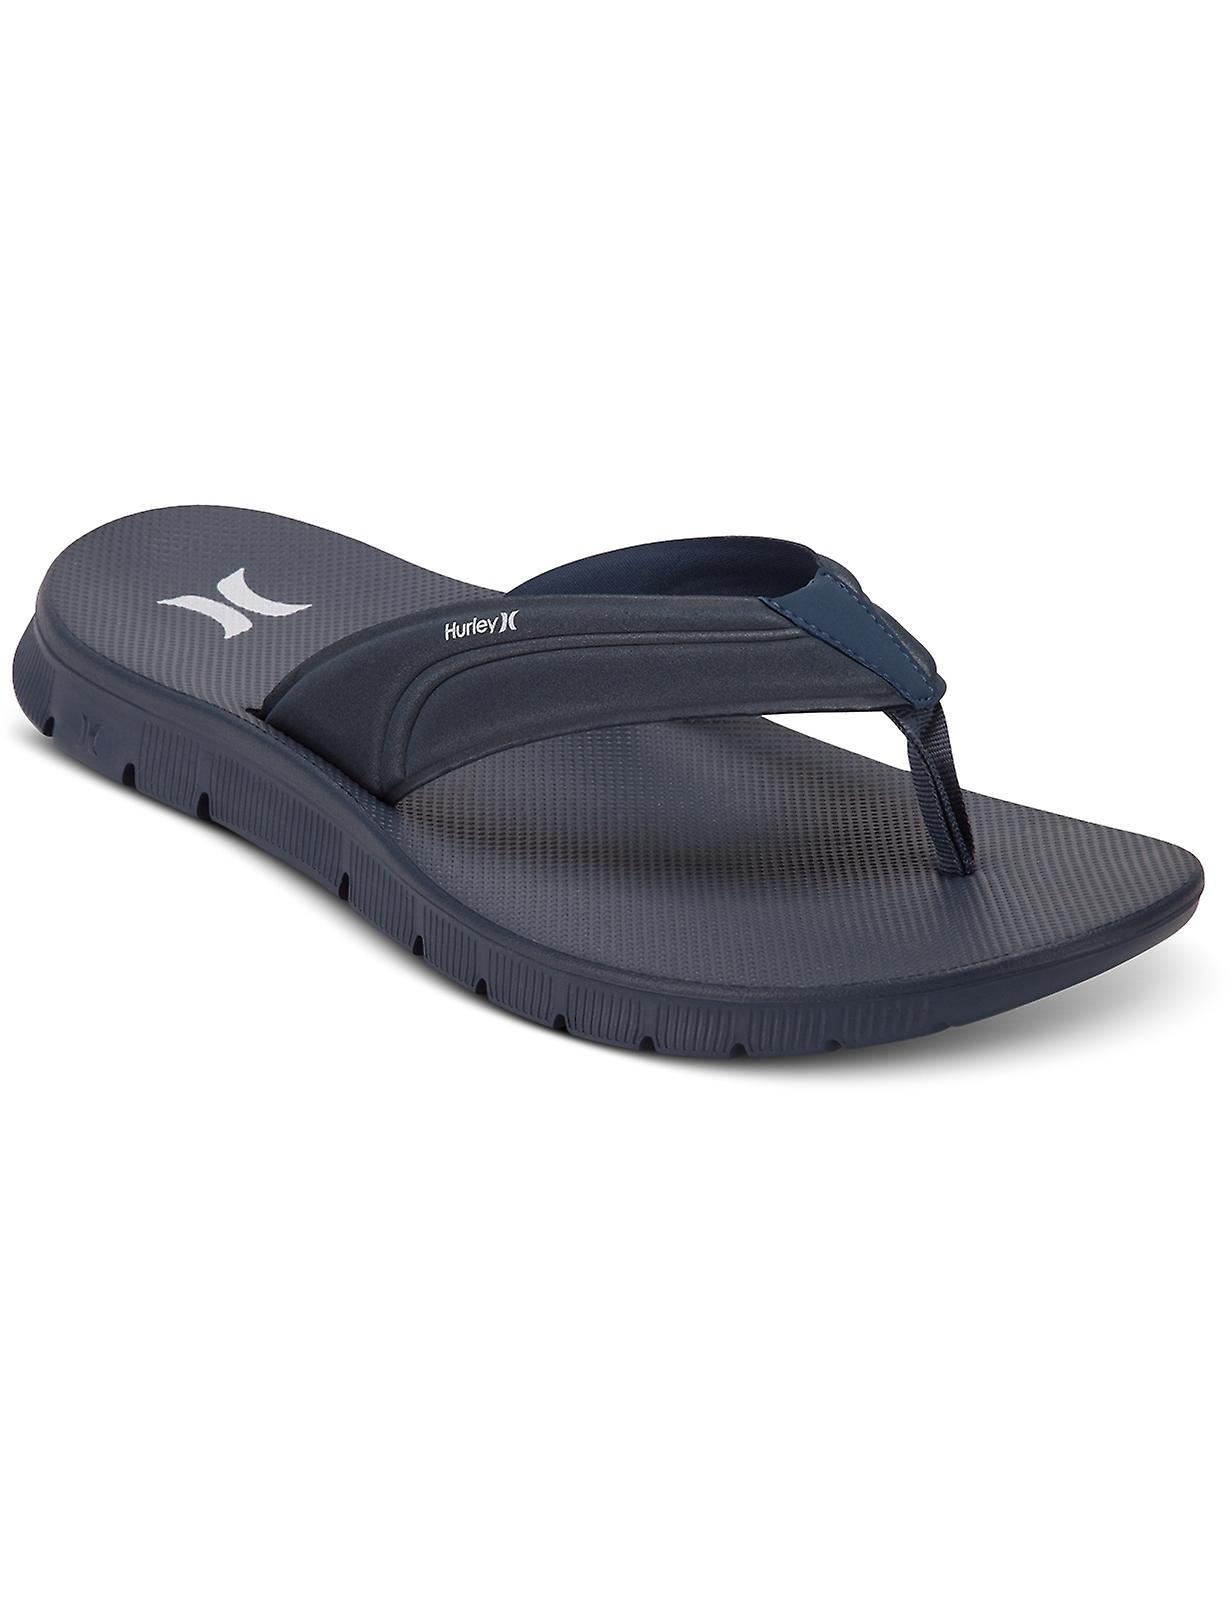 Hurley Fusion 2.0 sandália sandálias de esportes